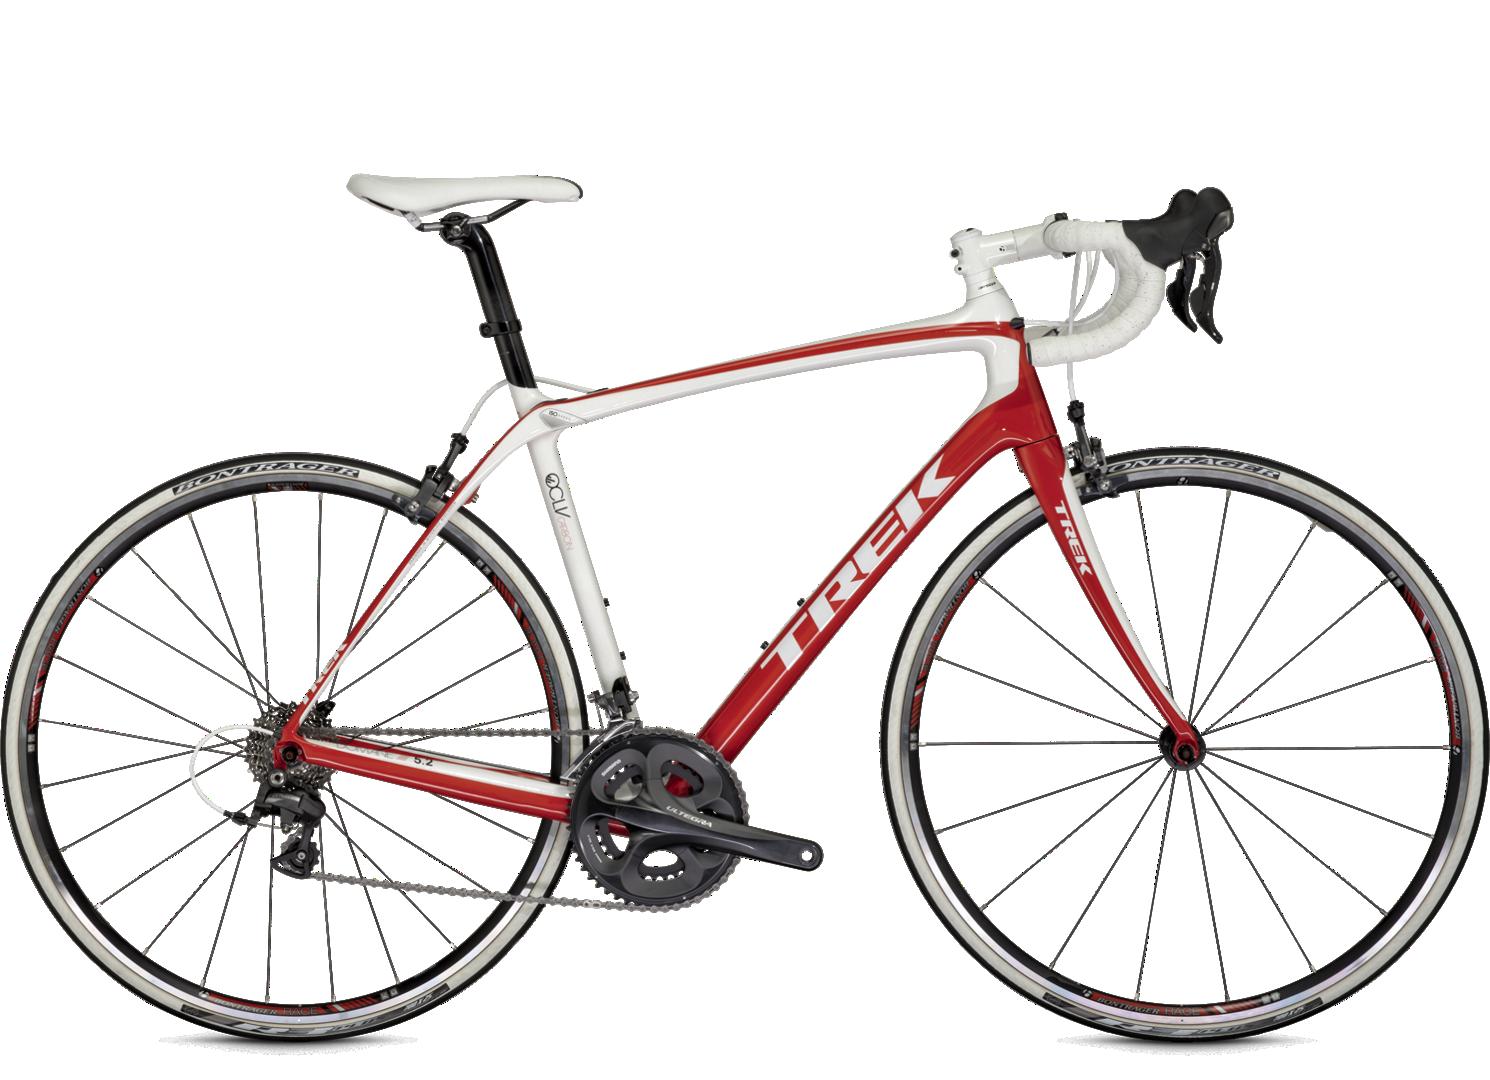 2013 Domane 5 2 Compact Bike Archive Trek Bicycle